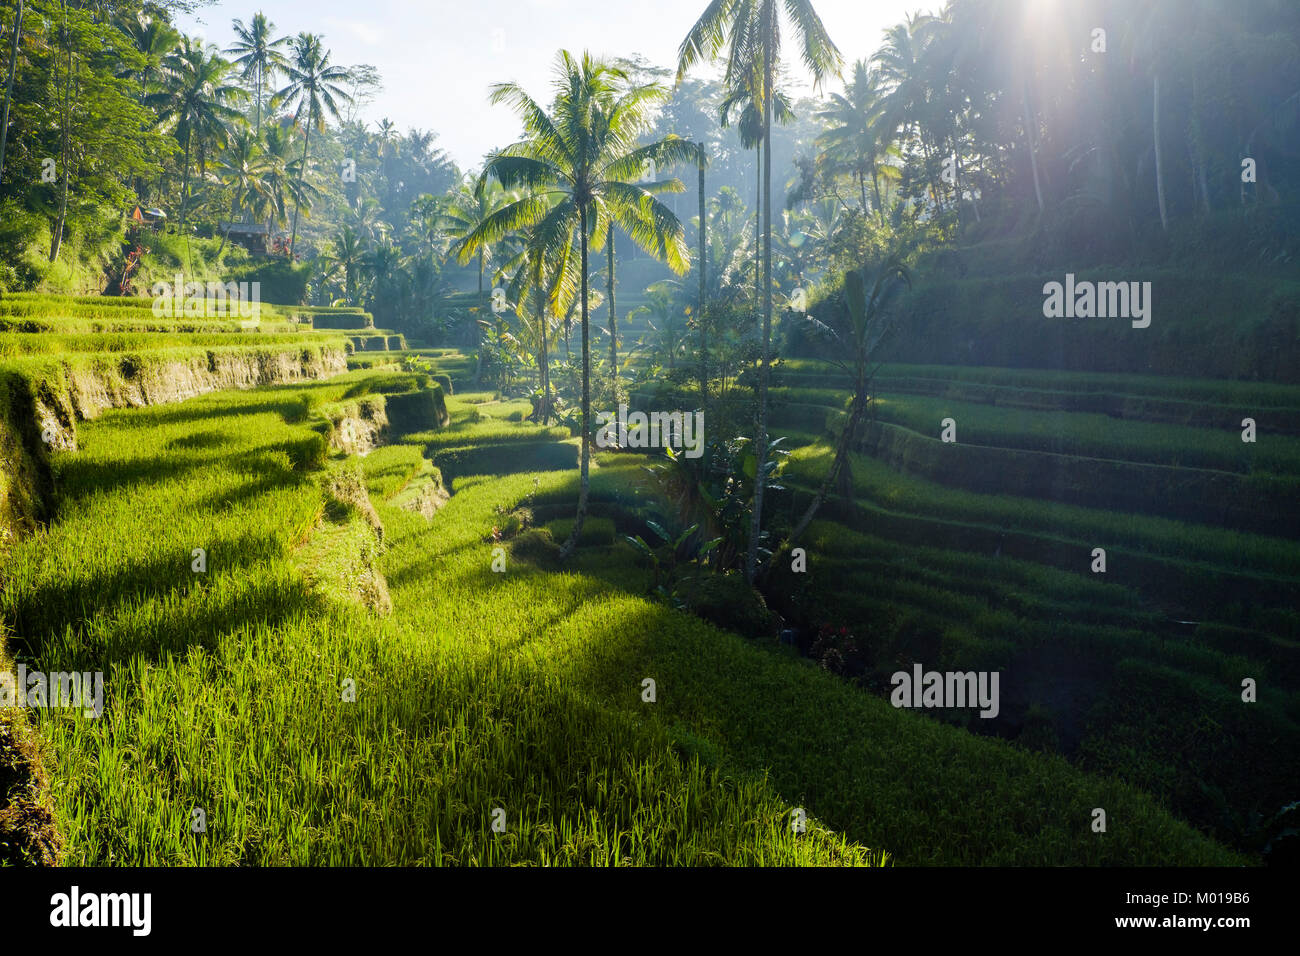 The Tegallalang rice terraces near Ubud, Bali, Indonesia. - Stock Image